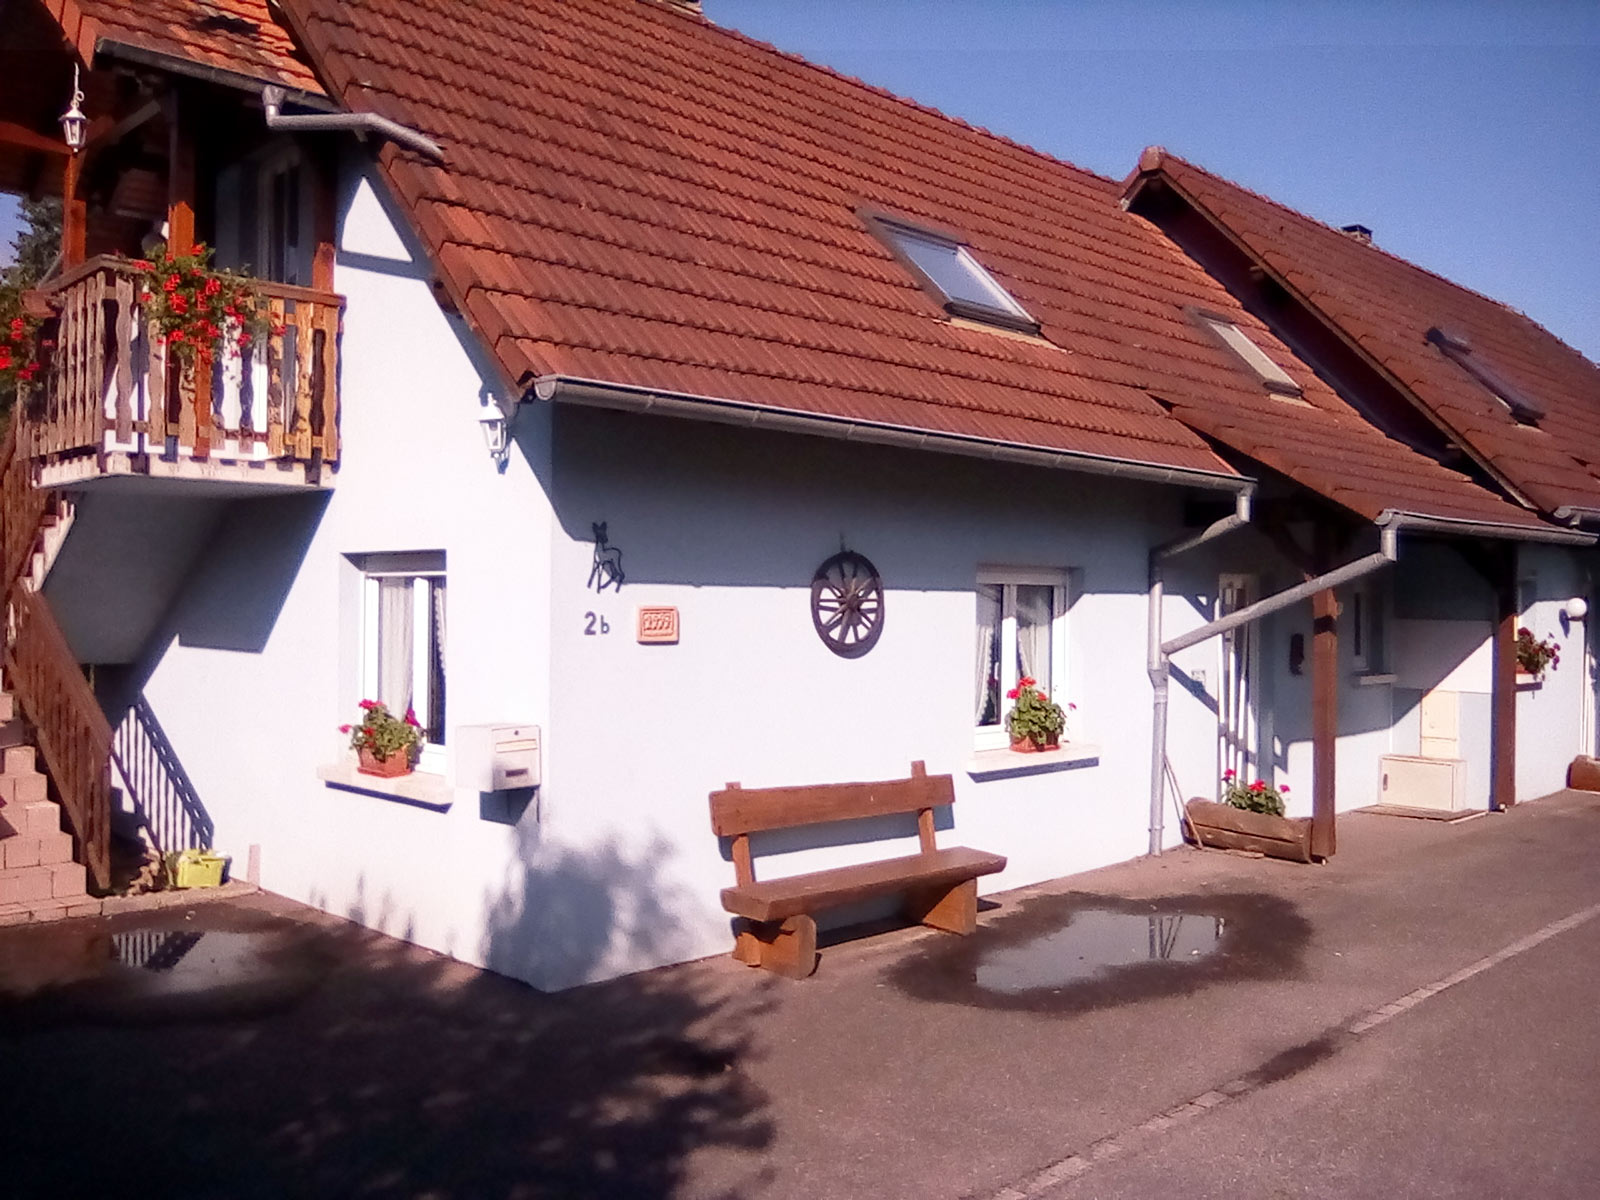 Accommodation of Mr. Heintz - Gîte de France n°1505